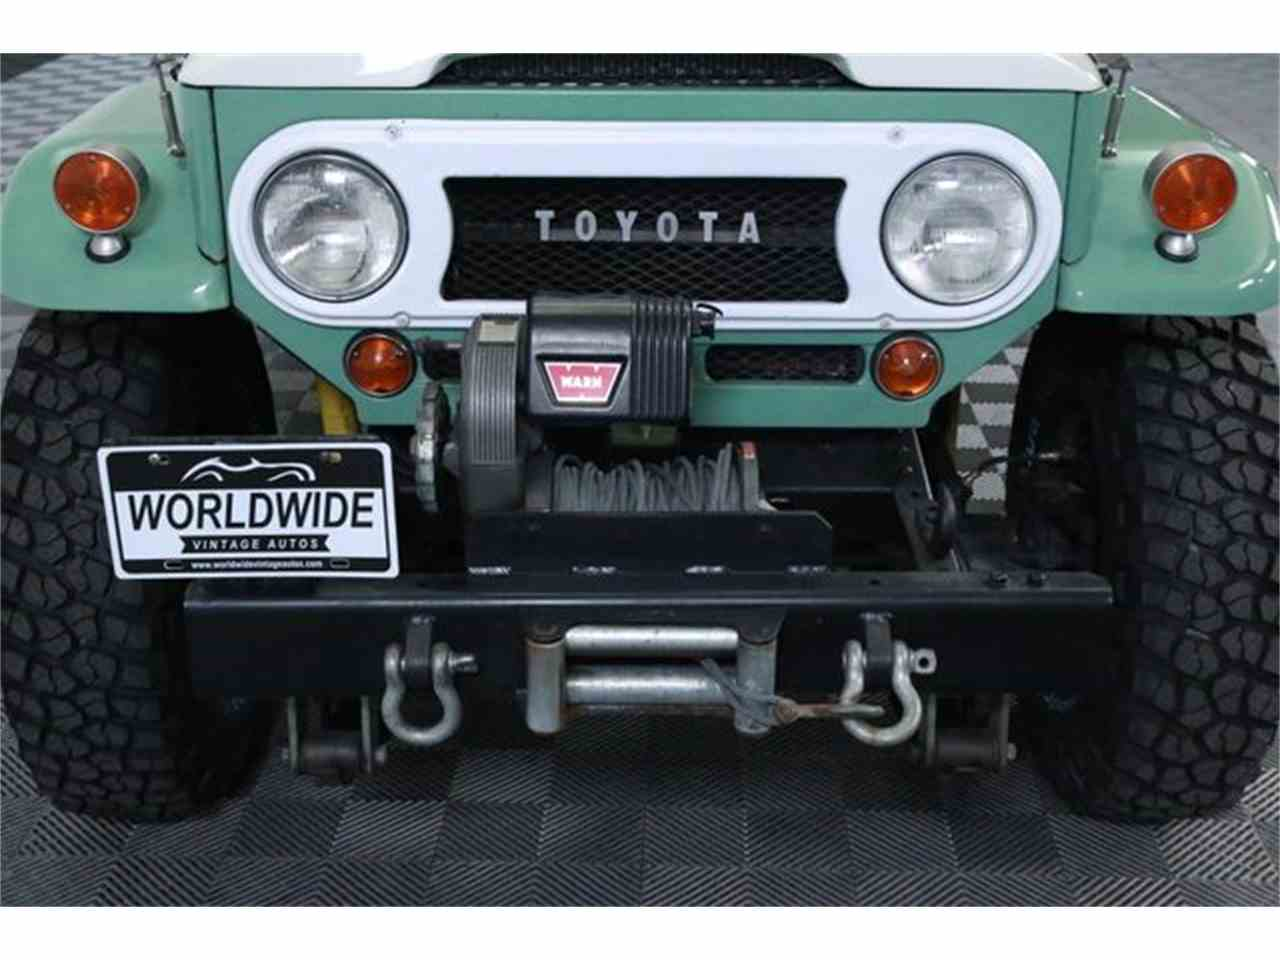 1966 Toyota Land Cruiser FJ45 for Sale | ClassicCars.com | CC-921181